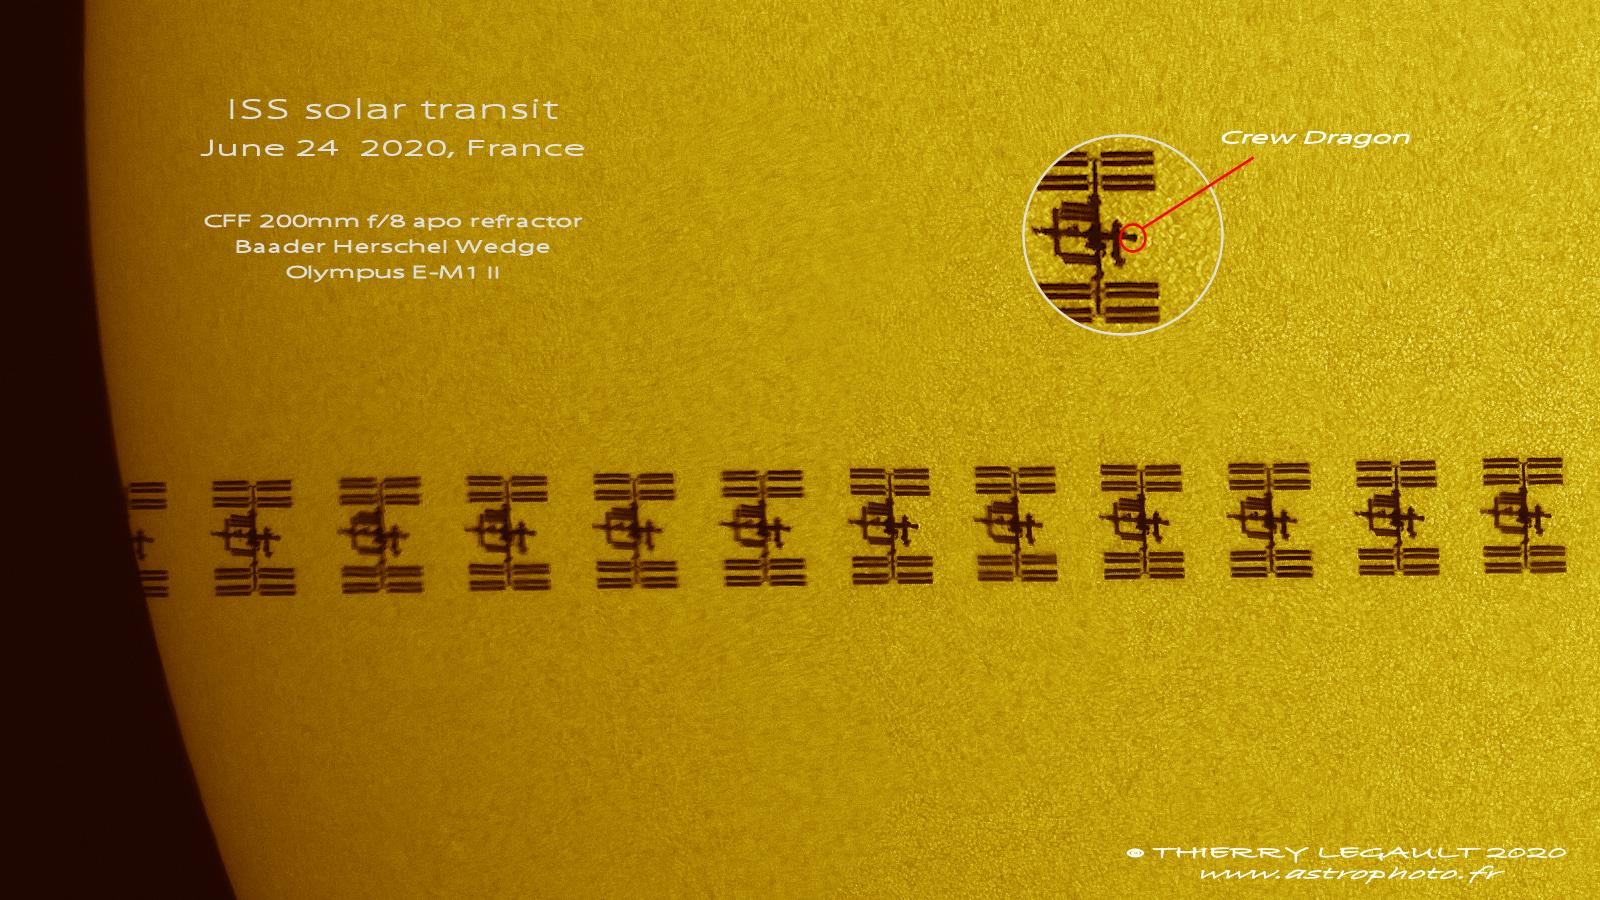 transit_iss_20200624_fb.jpg